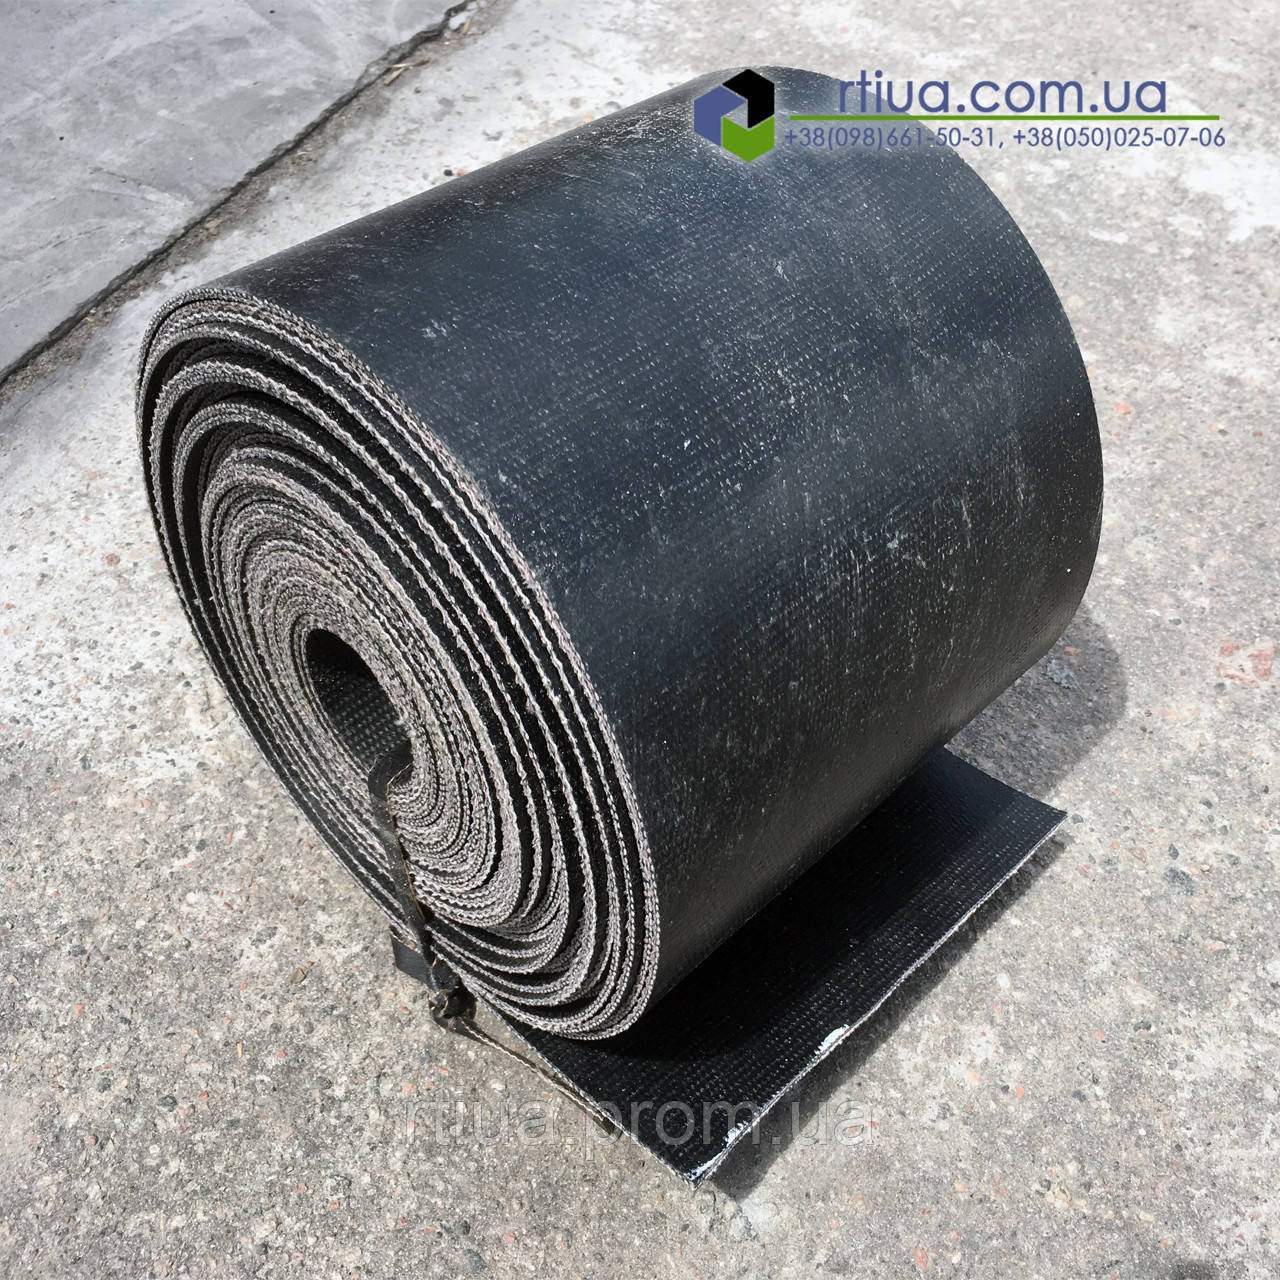 Транспортерная лента ТК-200, 400х3 - 3/1 (7 мм)